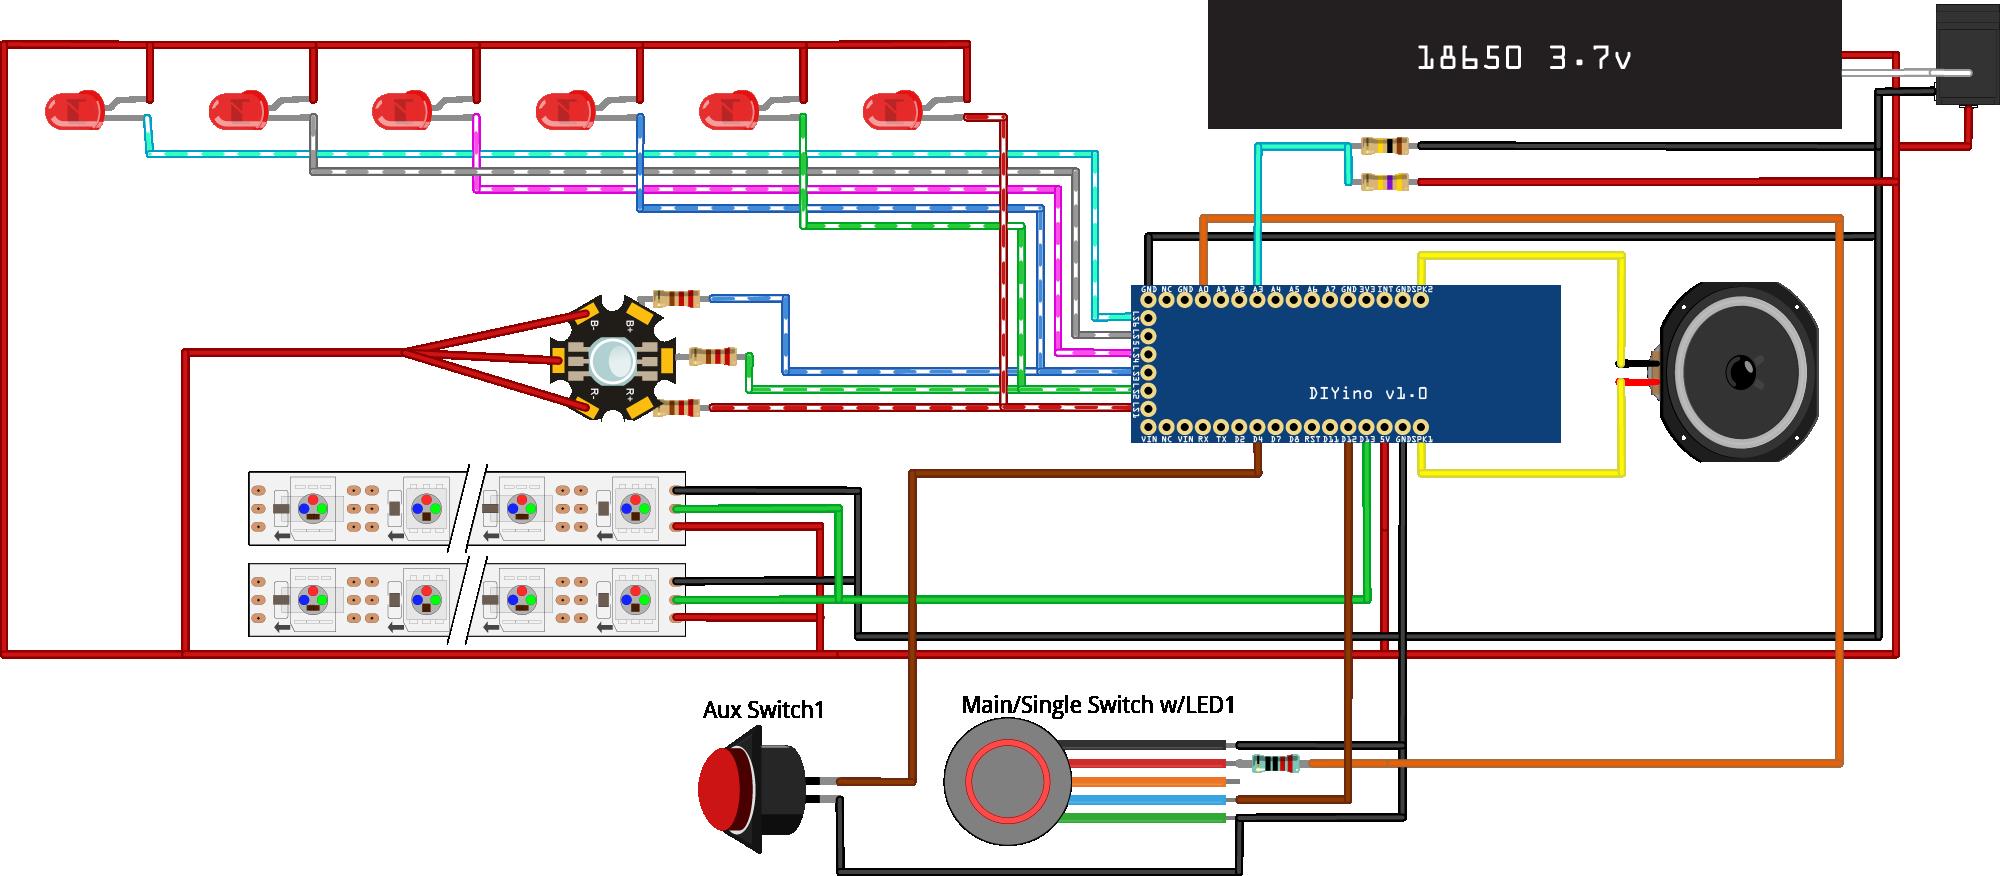 Wiring Protonerd Fx Saberos Wiki Github Lightsaber Diagram For Soundboard Diyino